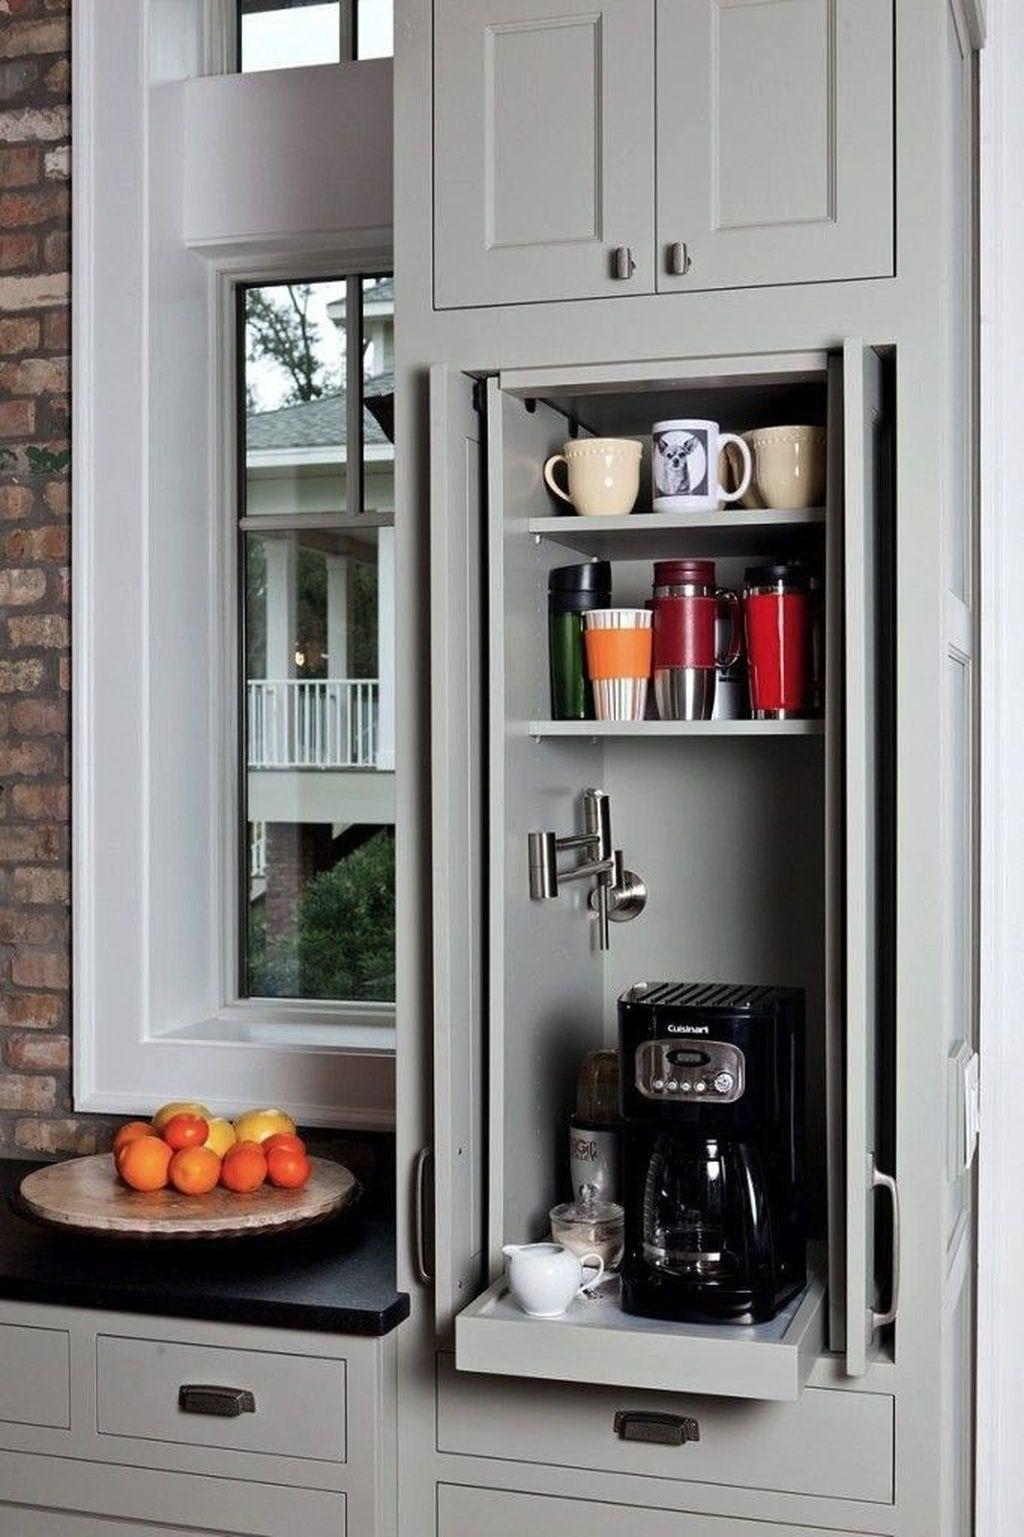 50 Great Coffee Organization Ideas Kitchen